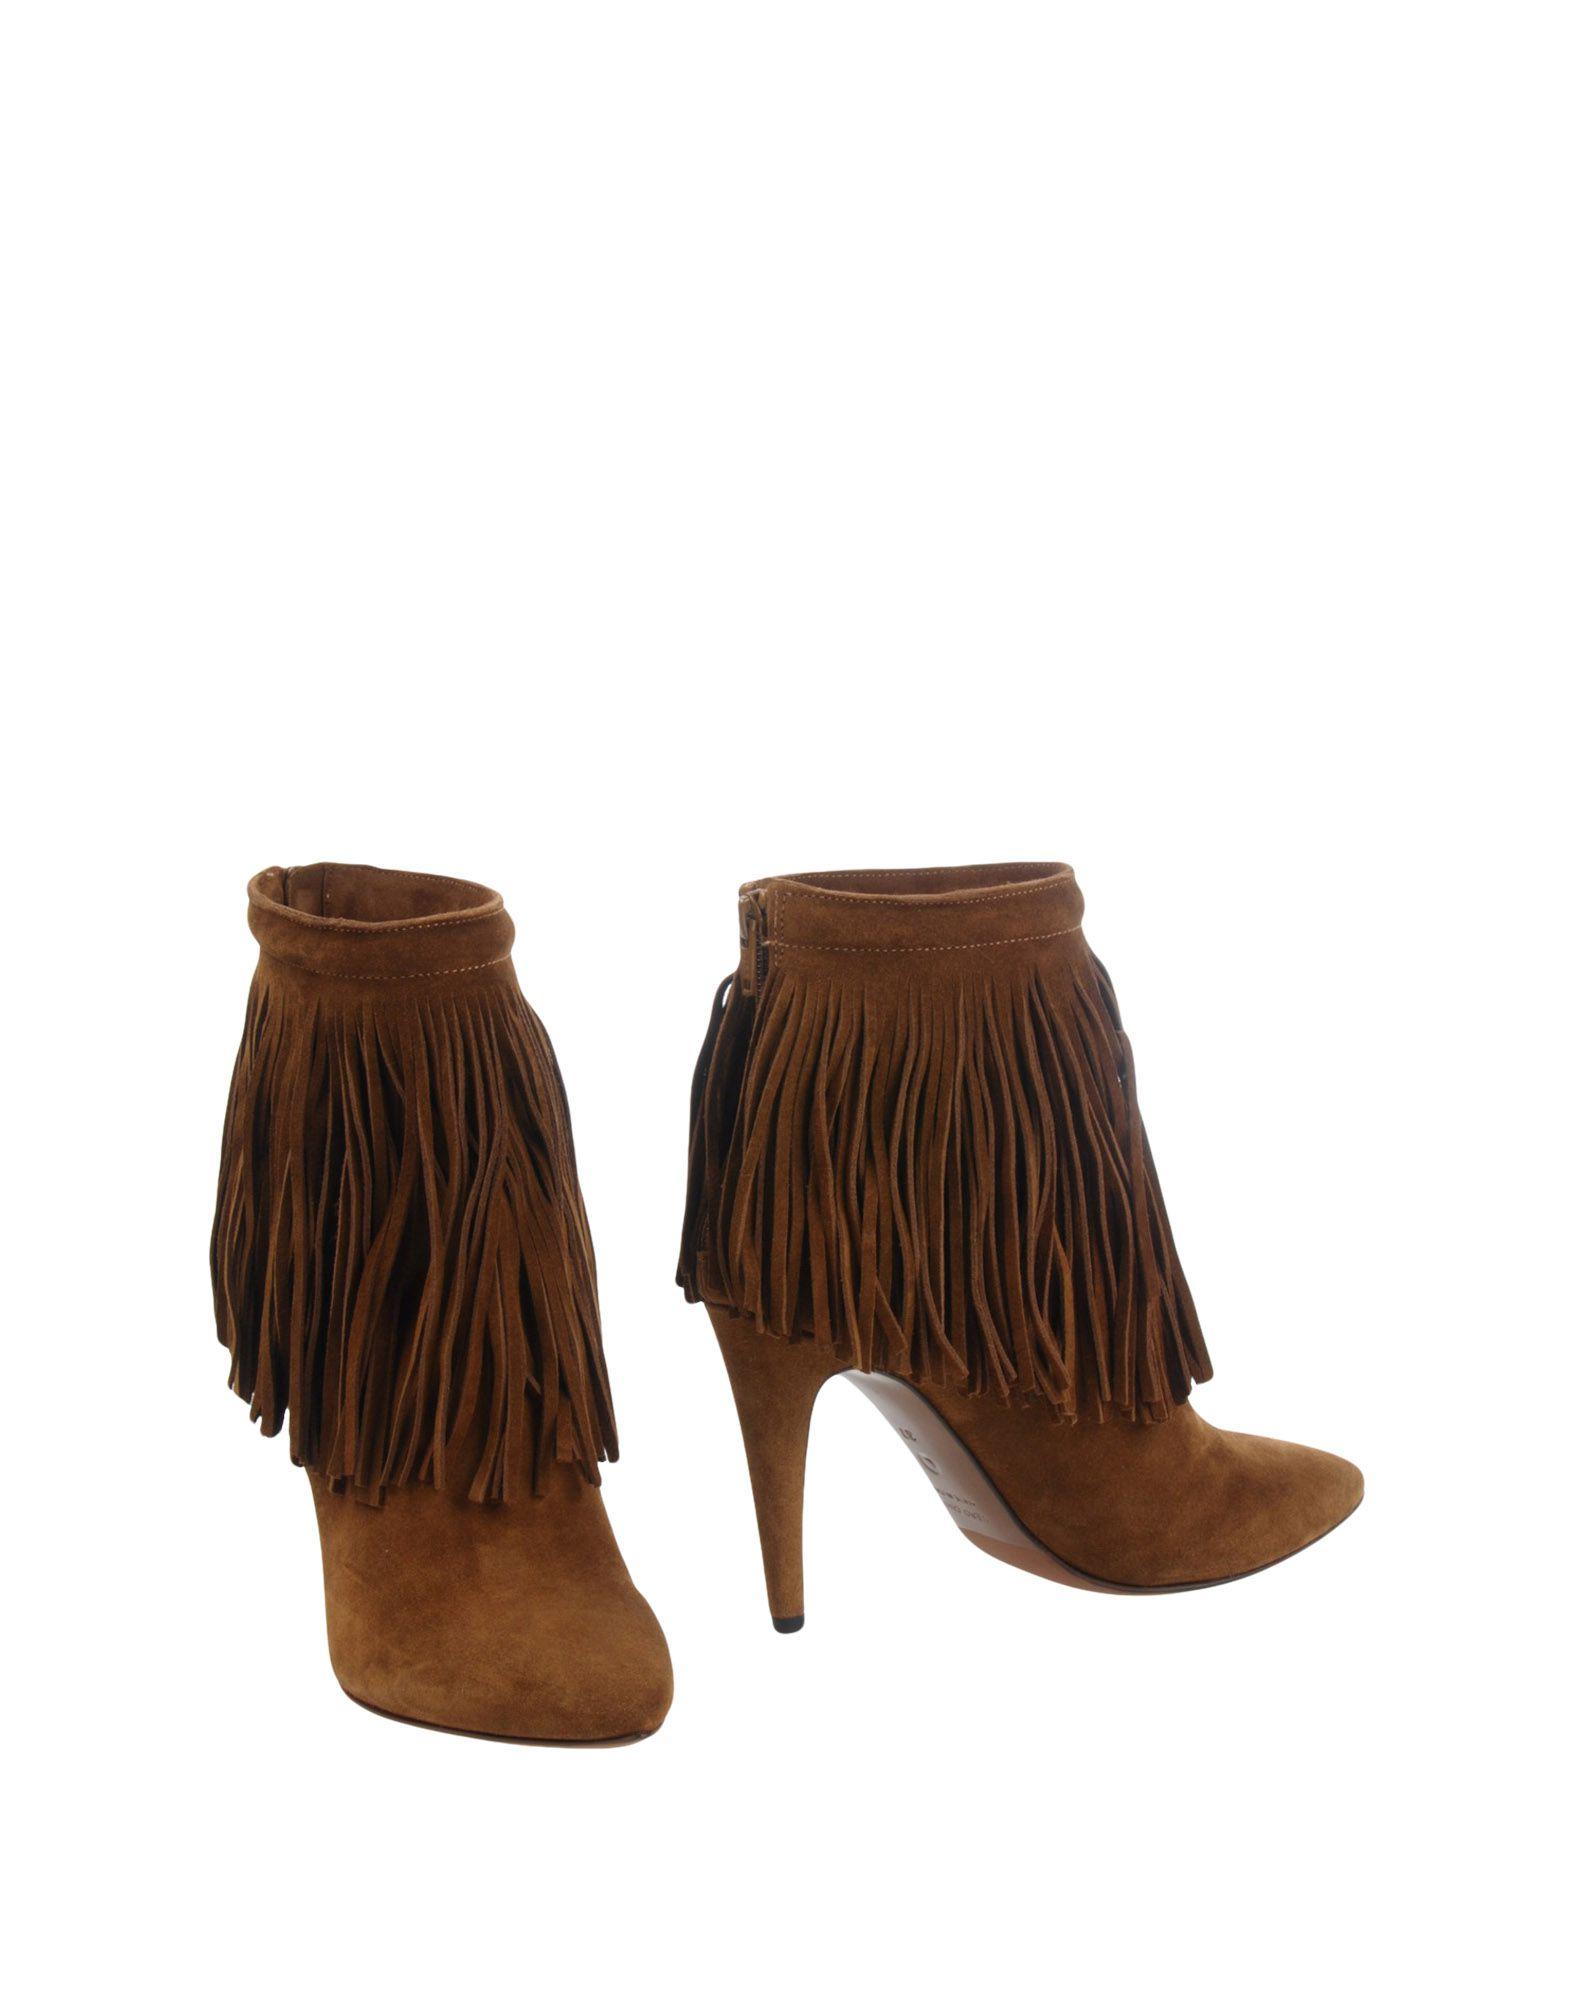 L' Autre Chose Stiefelette Damen  11277691JEGut aussehende strapazierfähige Schuhe